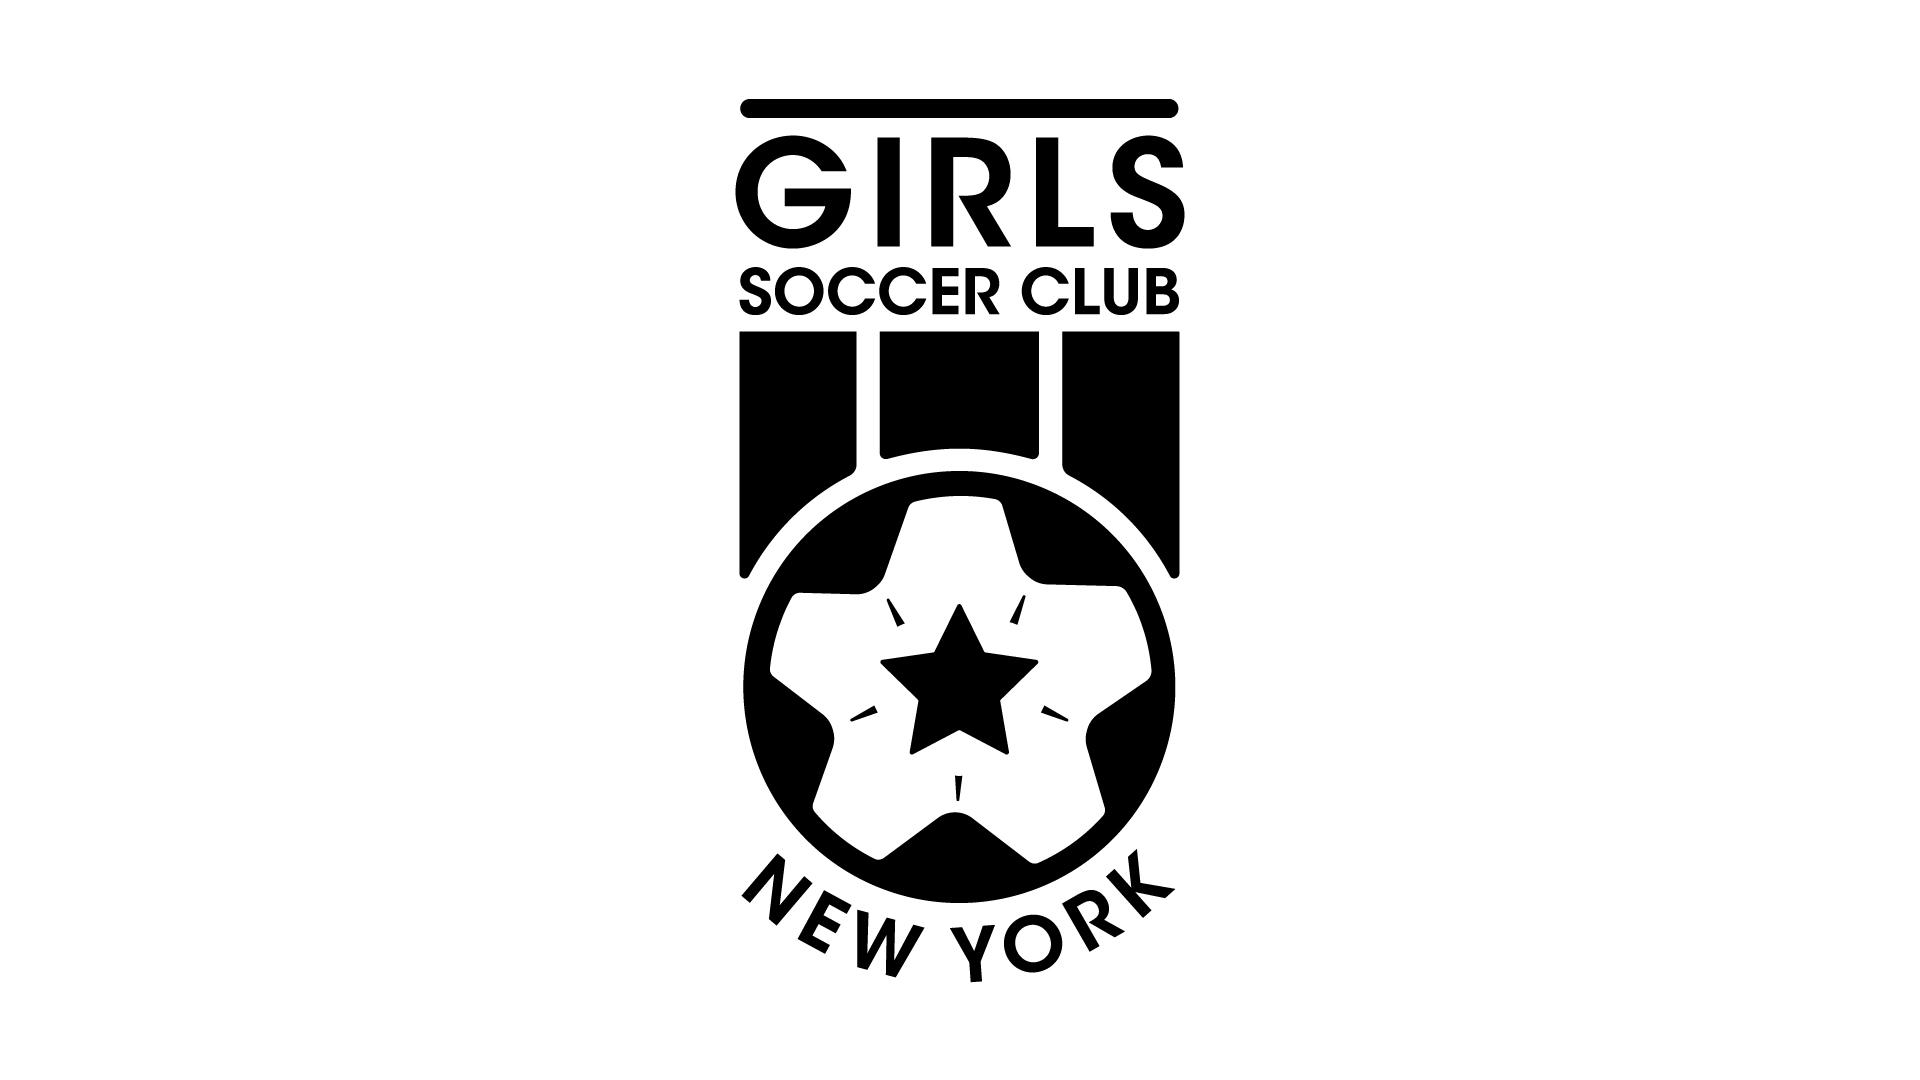 GSC---New-York---Black.jpg